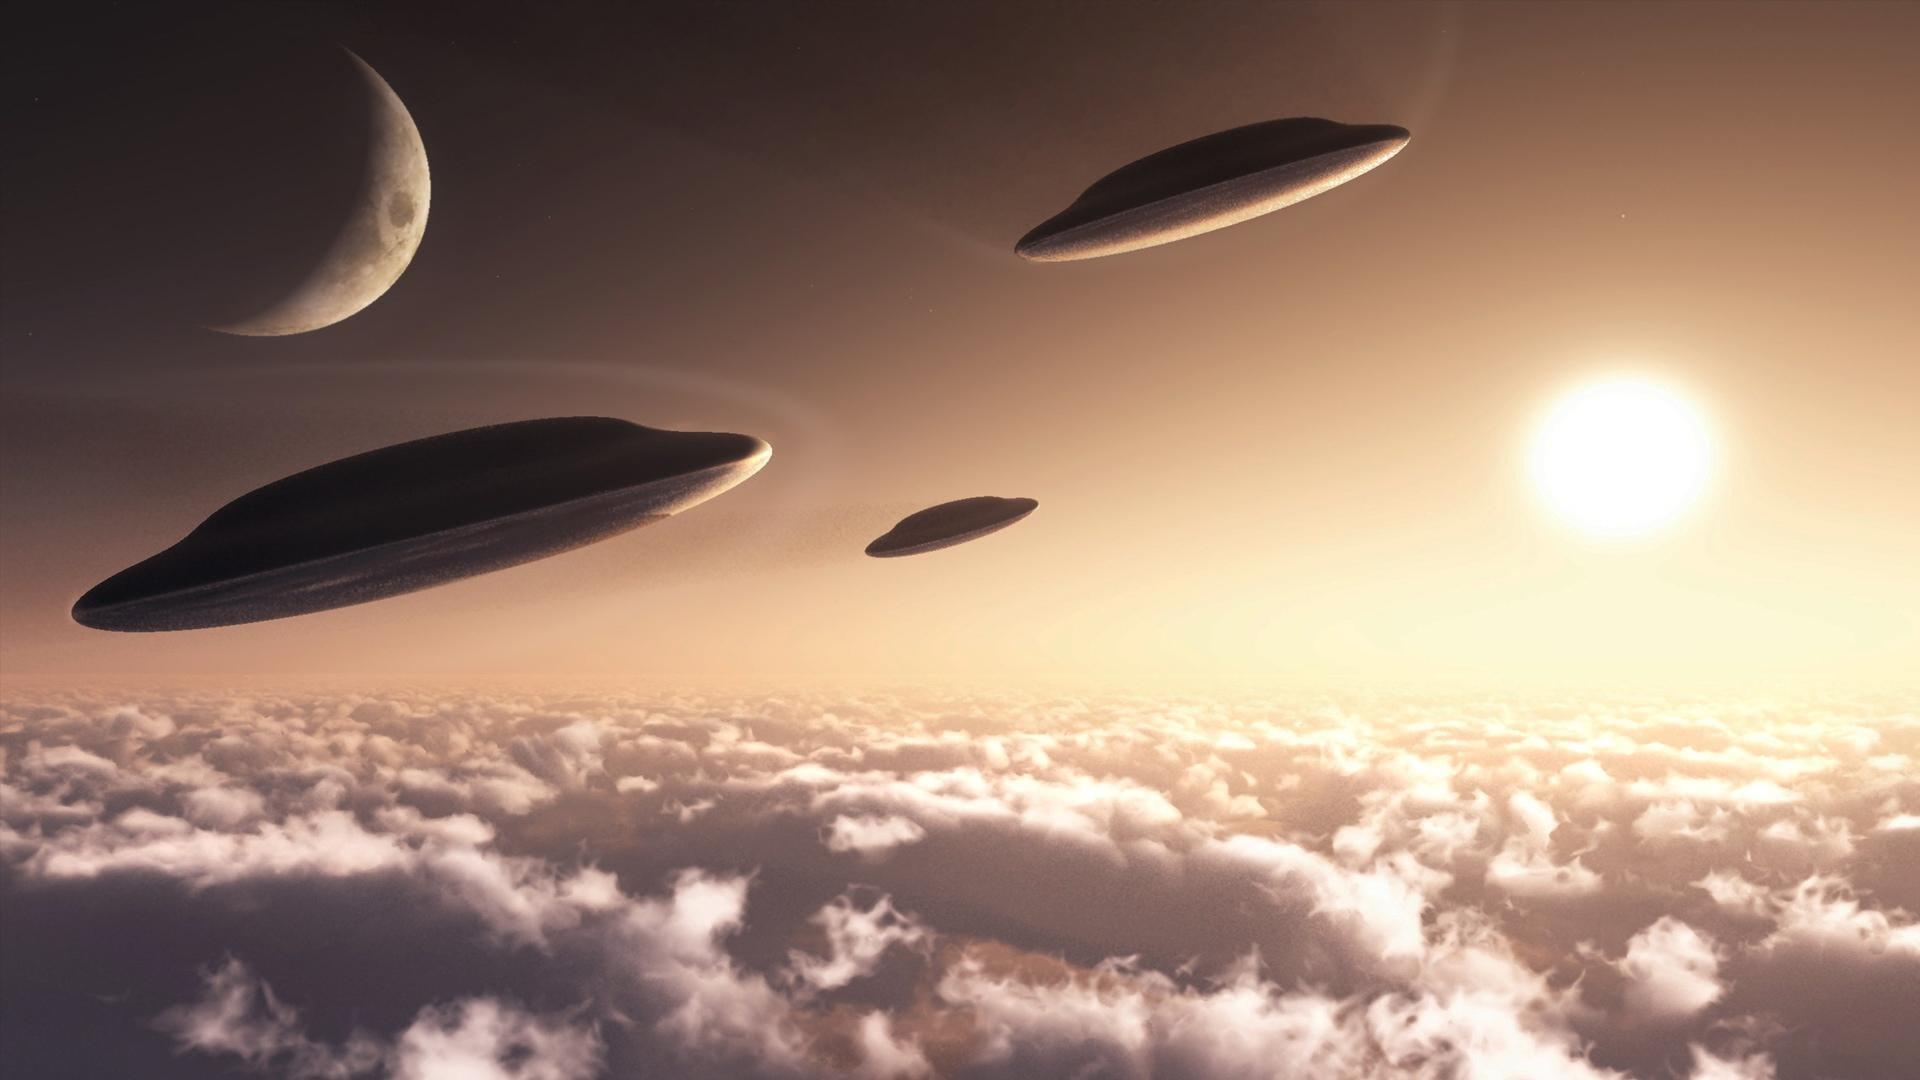 High Resolution Wallpaper   UFO 1920x1080 px